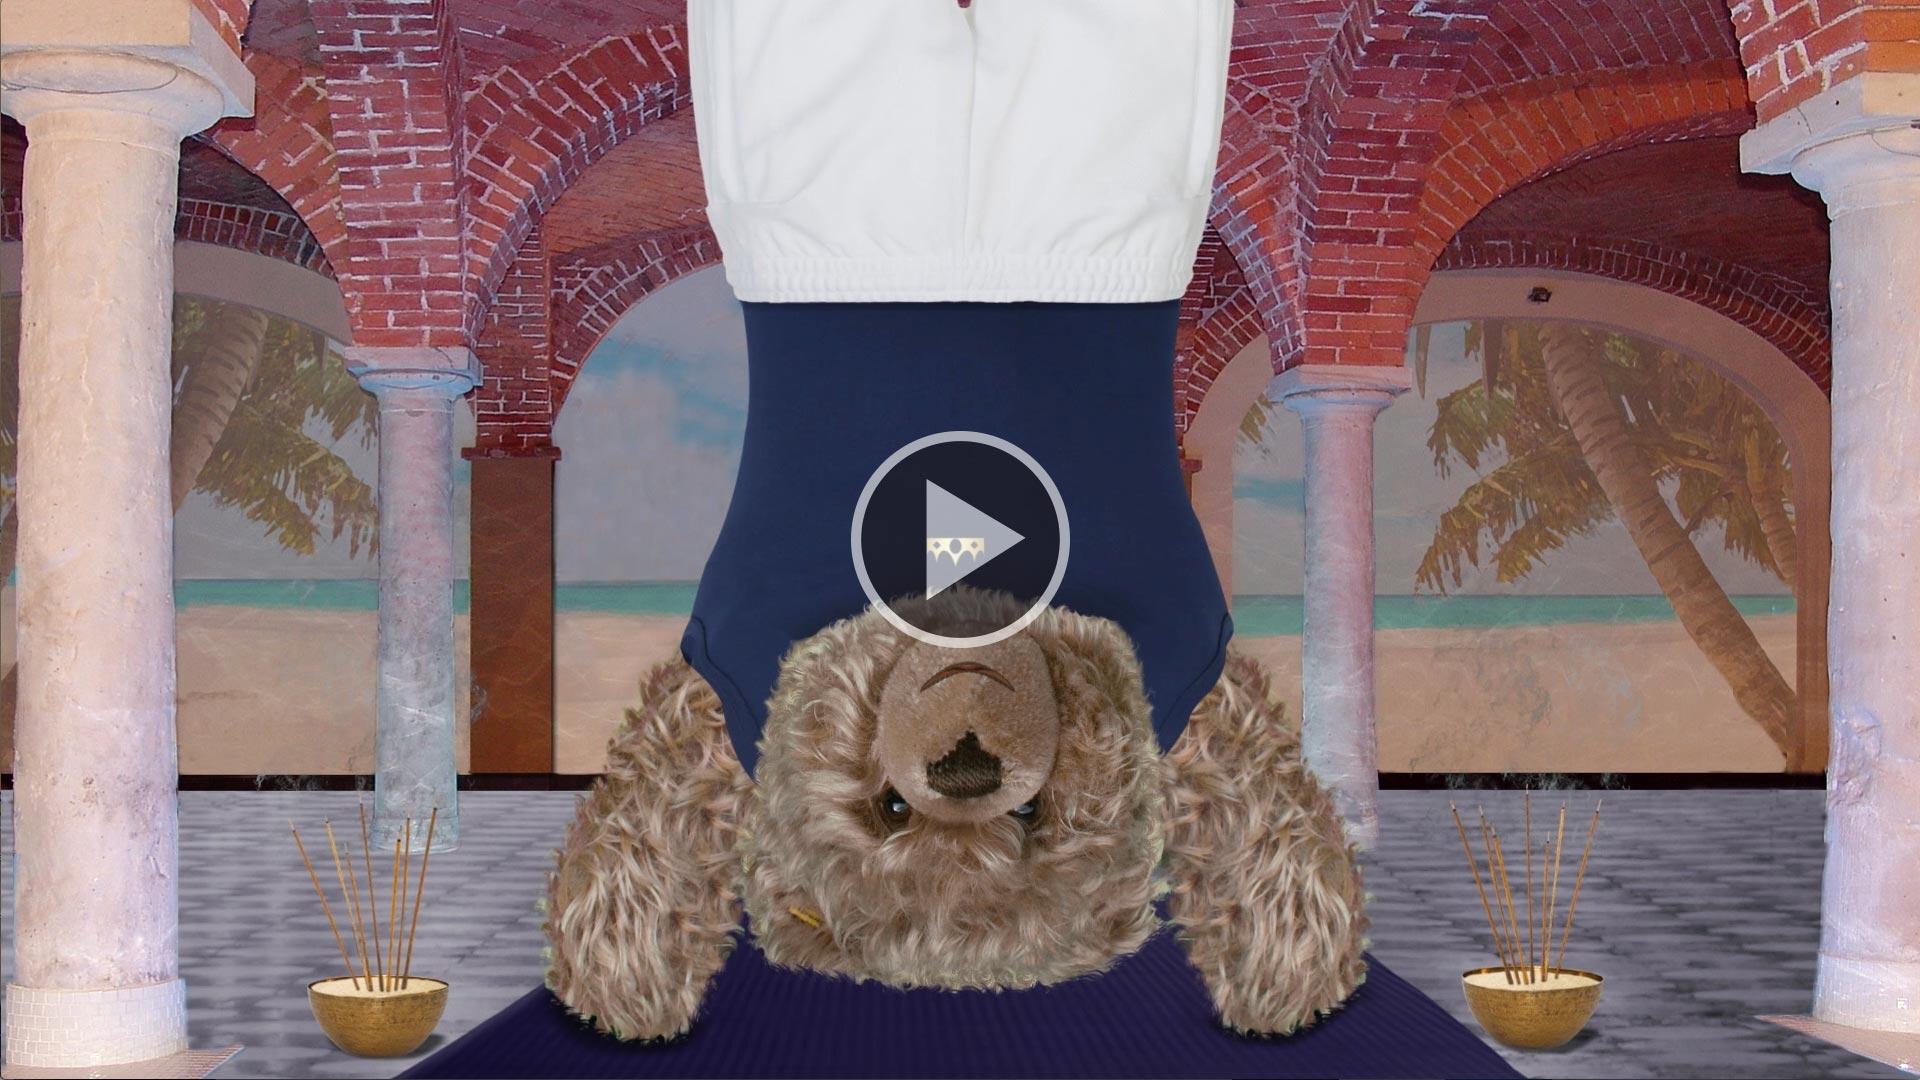 Teddy-König Opa macht Yoga